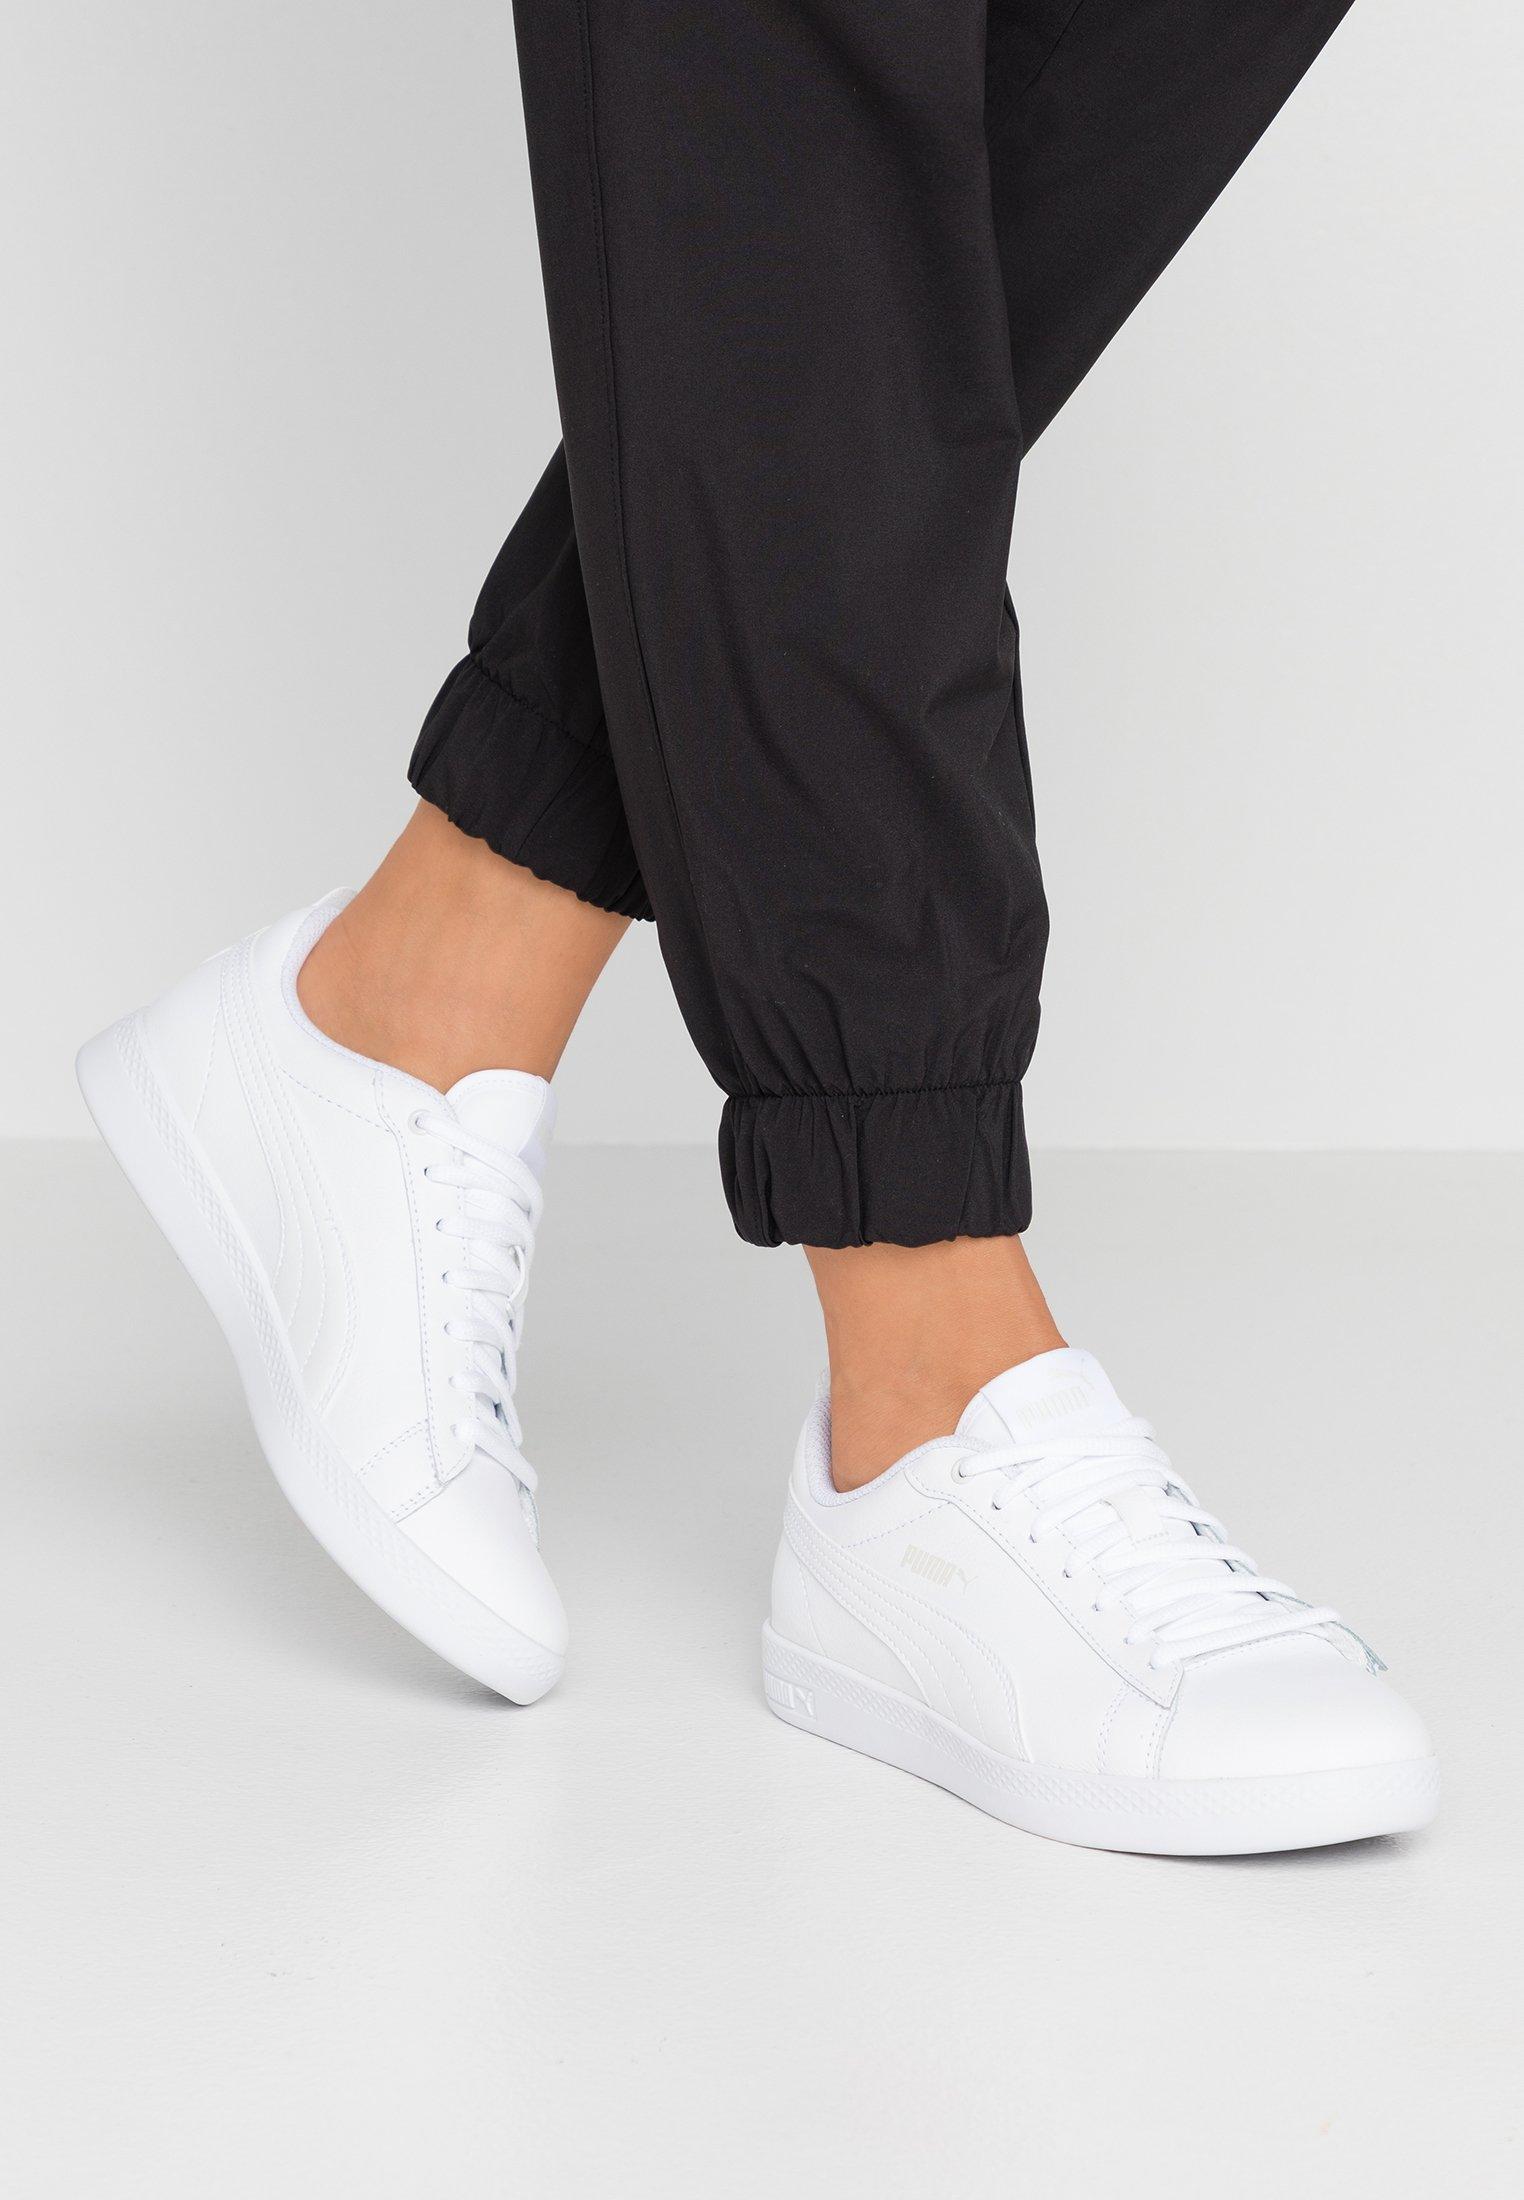 Femme SMASH - Baskets basses - white